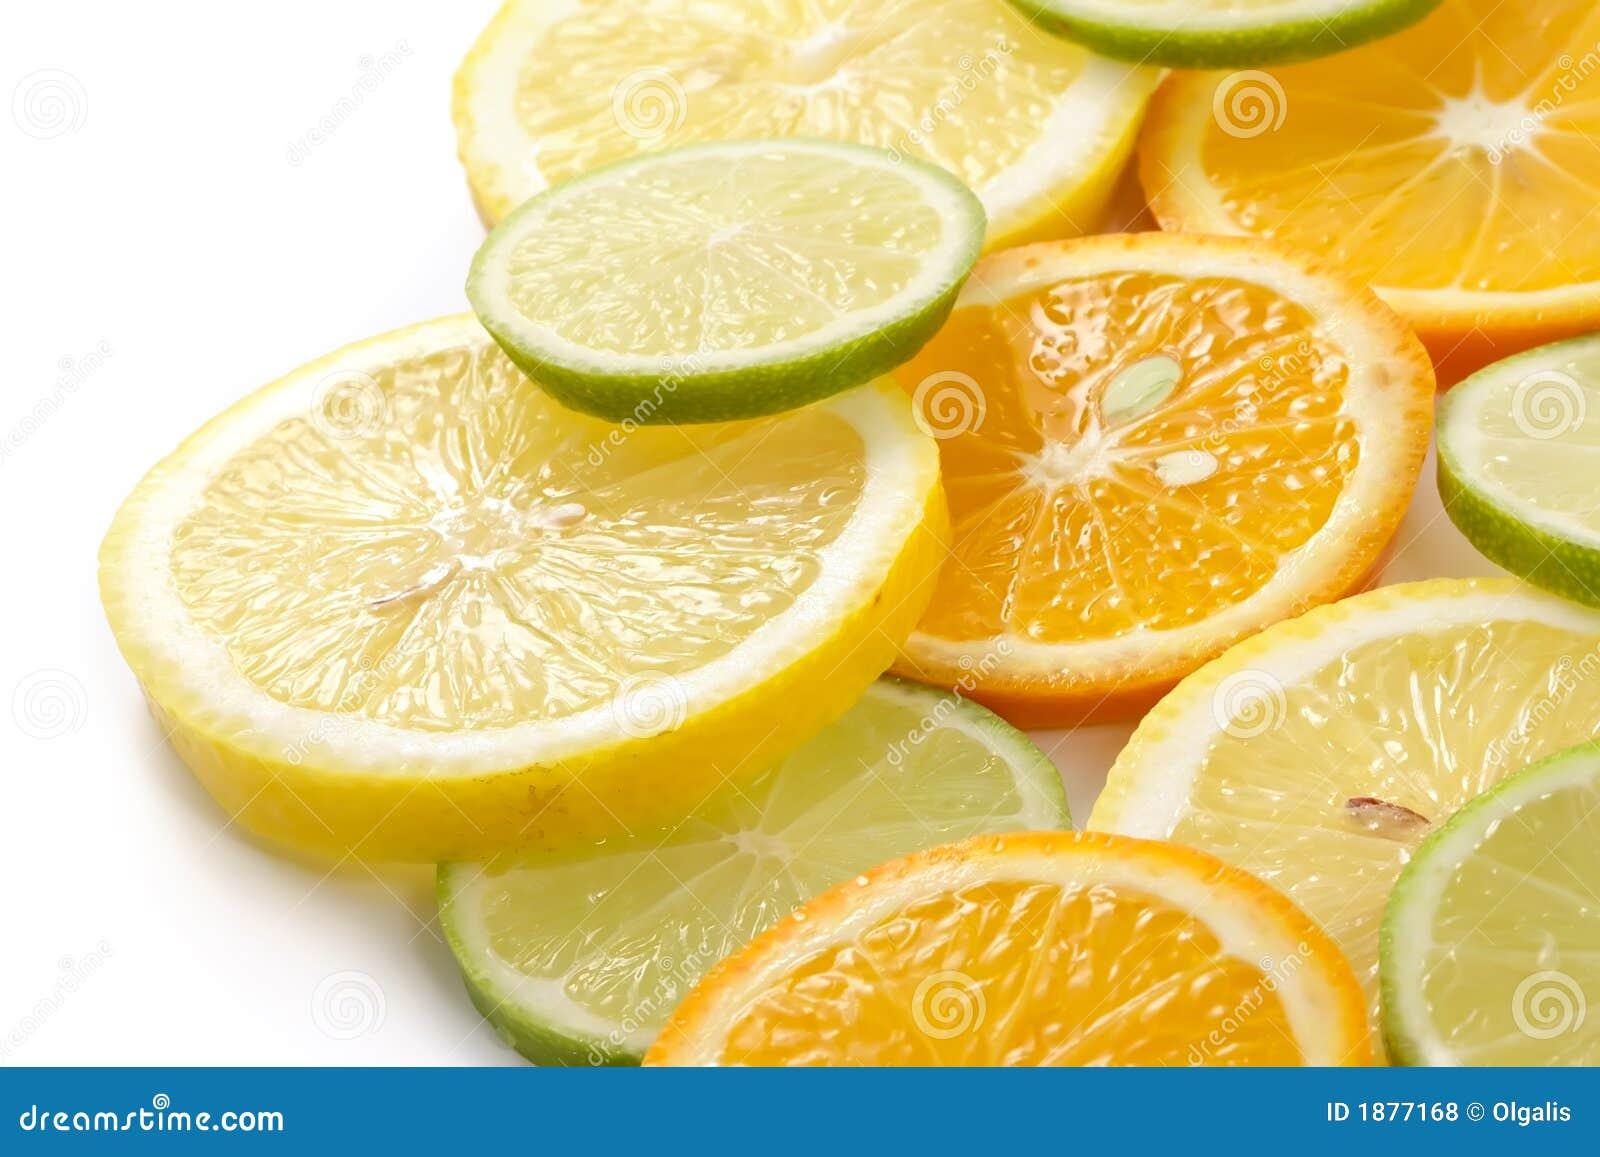 Citron allsorts-kalk, citroen, mandarijn